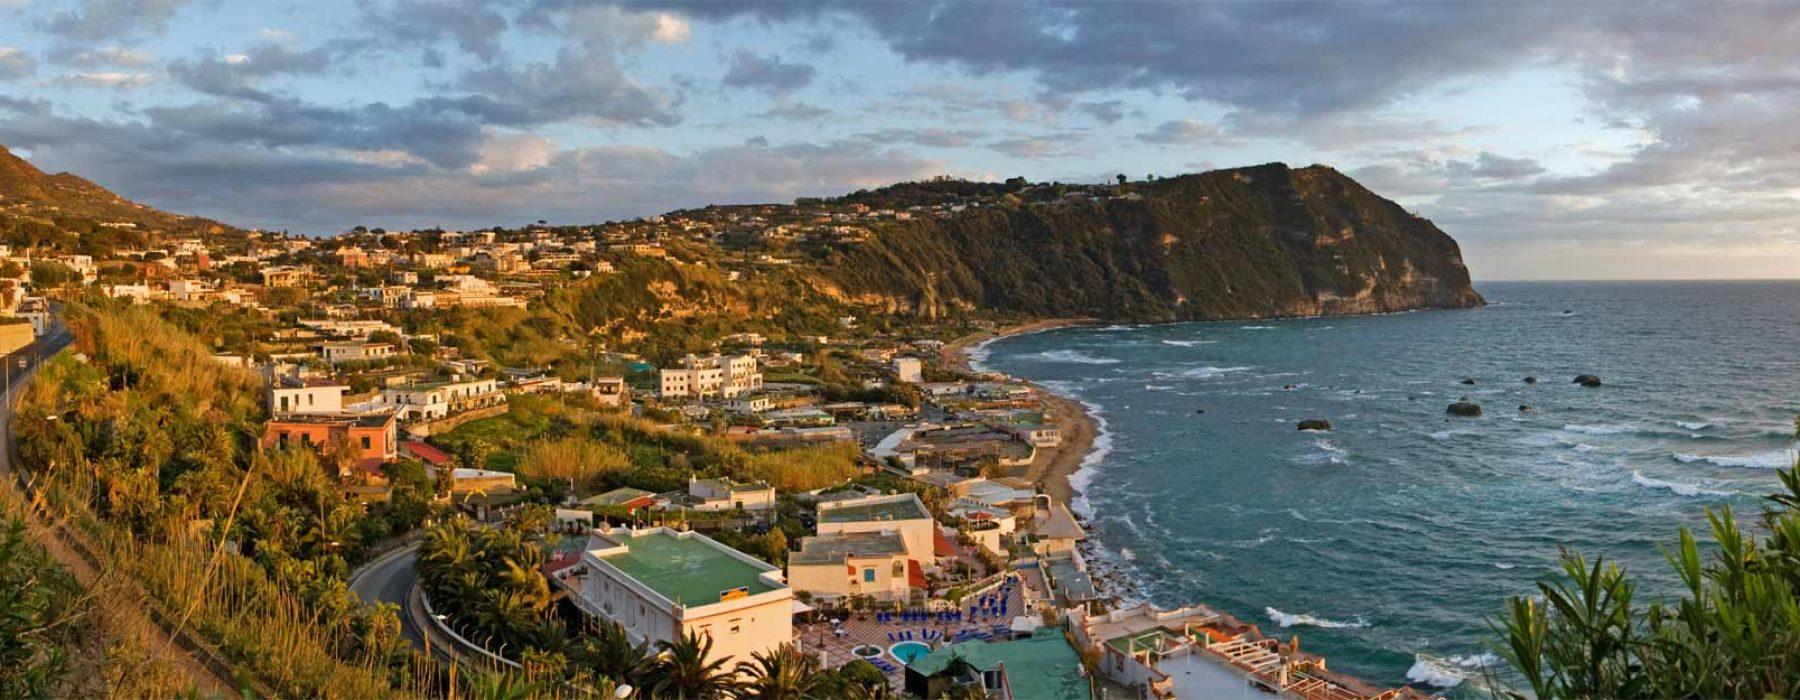 Kingdom of two Sicilies: beautiful green terraces overlooking the sea, Mortella, Negombo and Villa San Michele